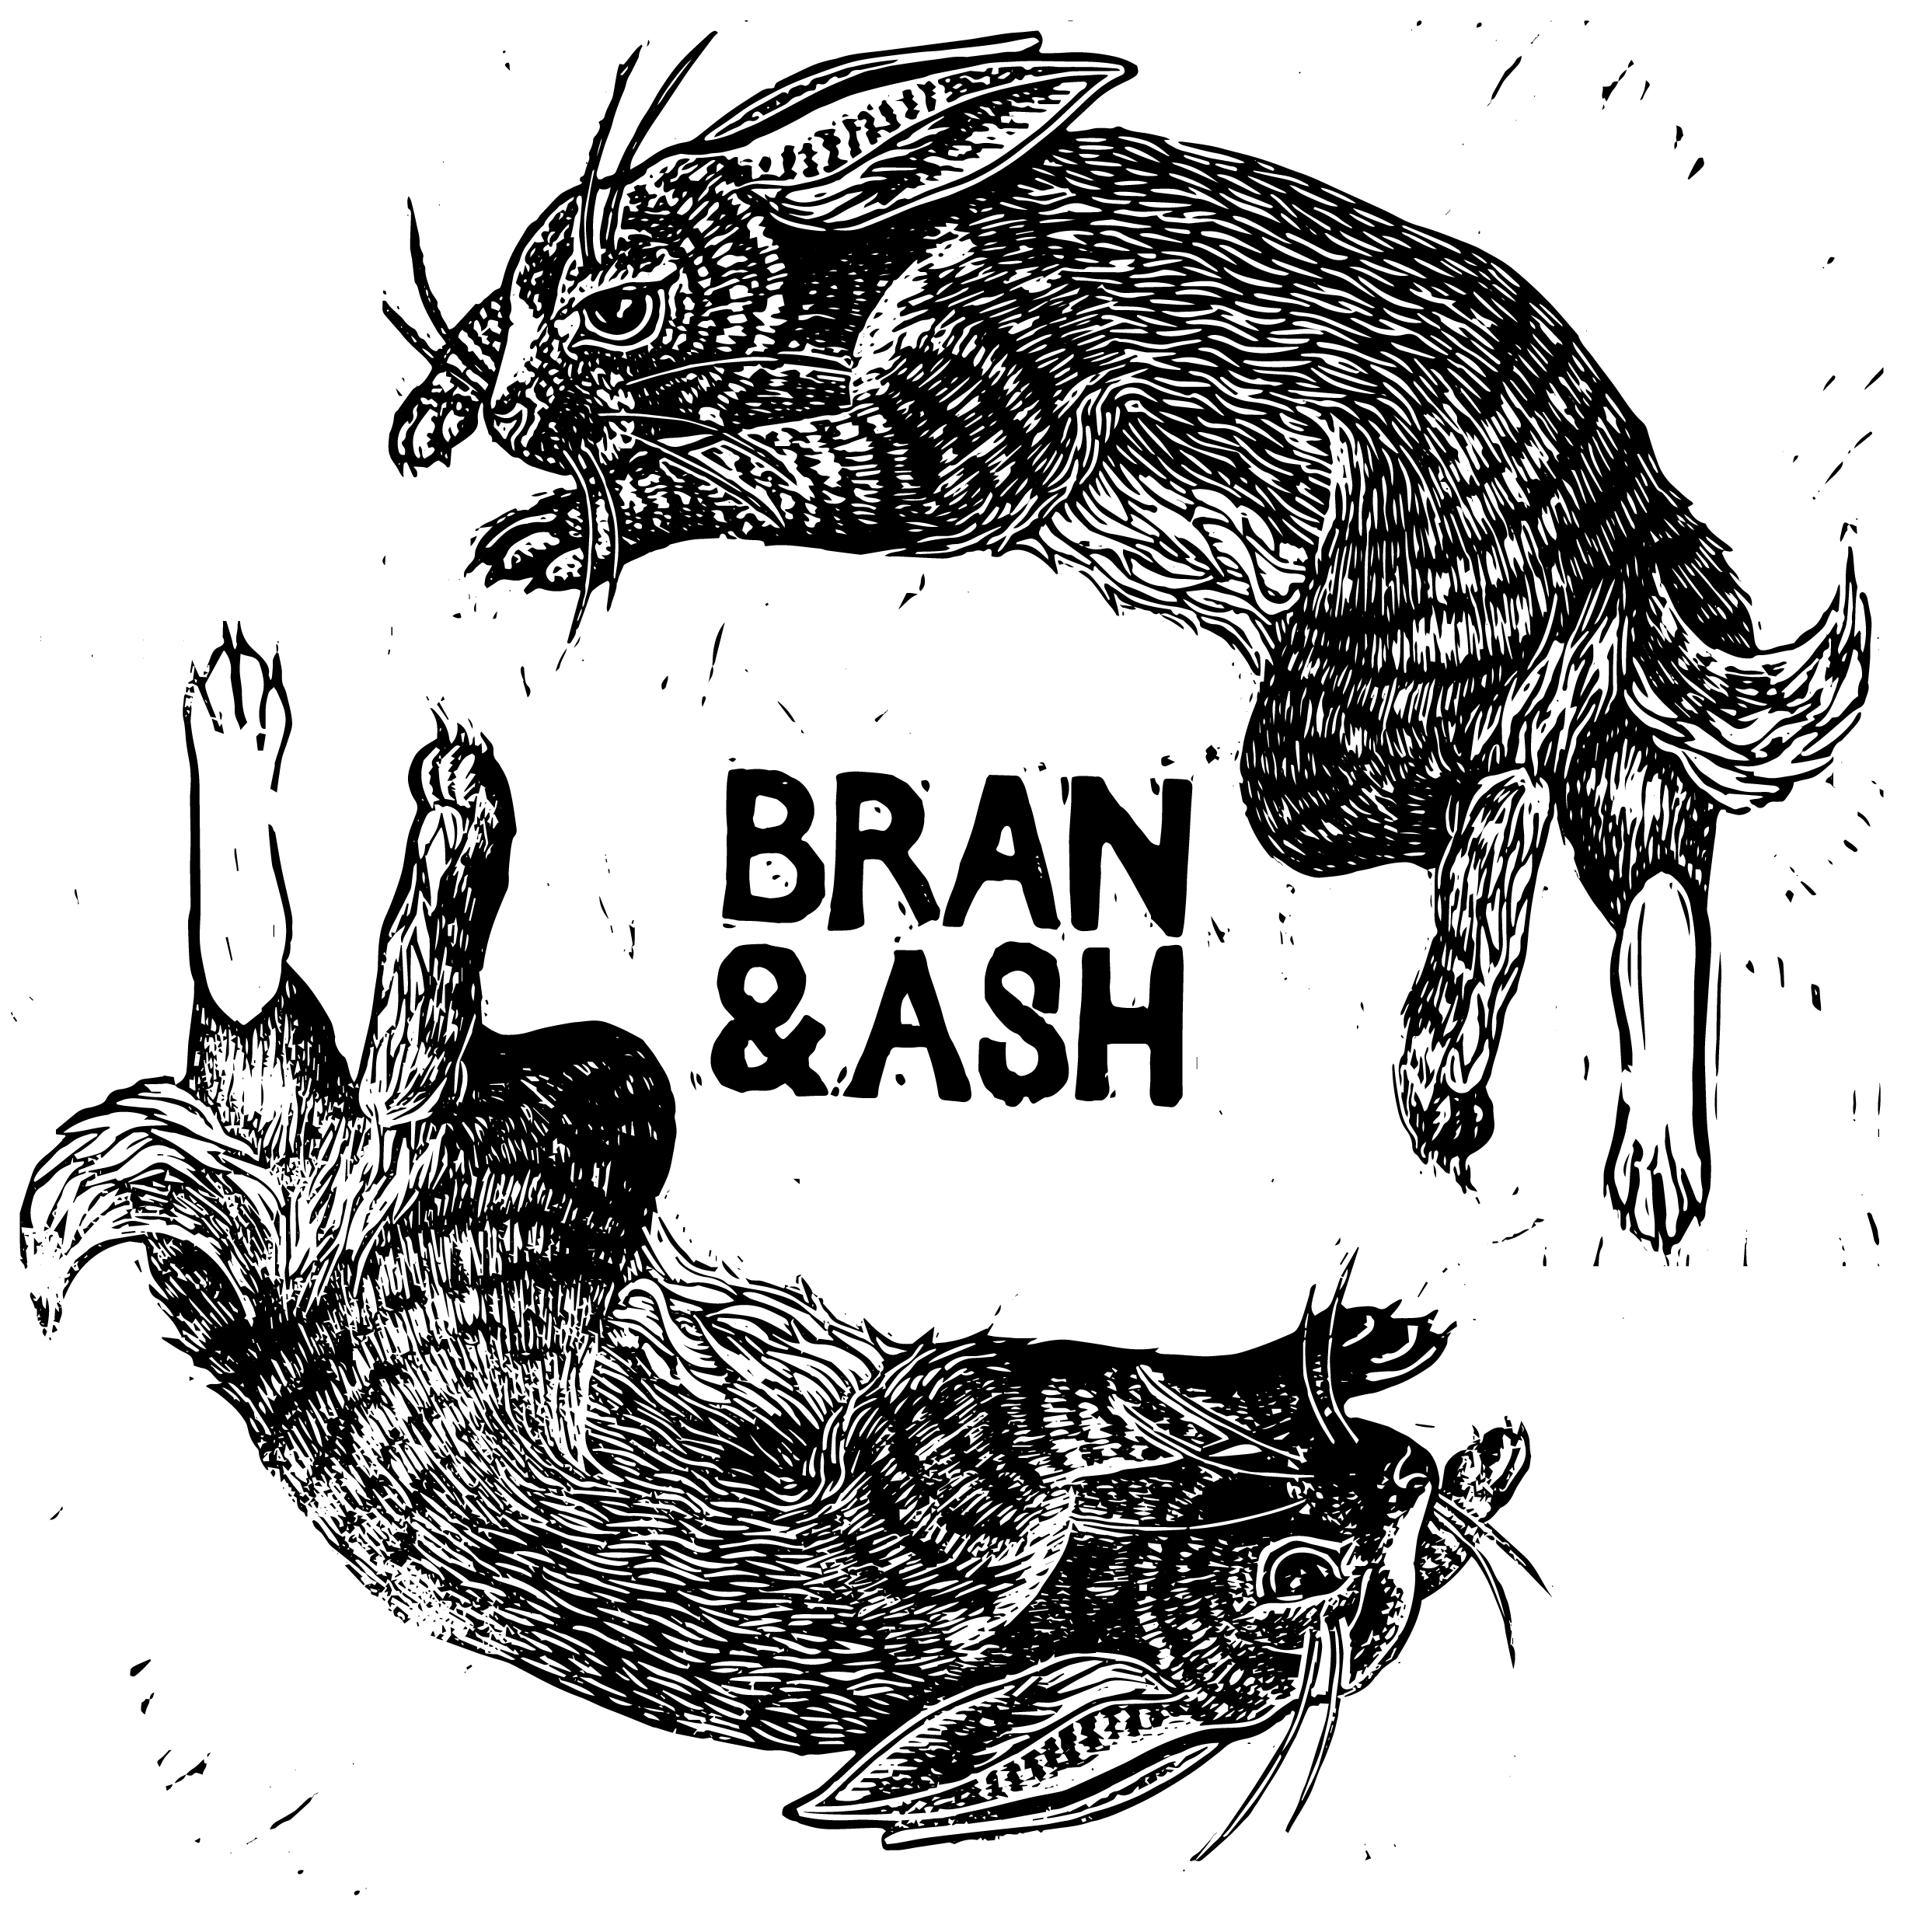 Bran & Ash LLC